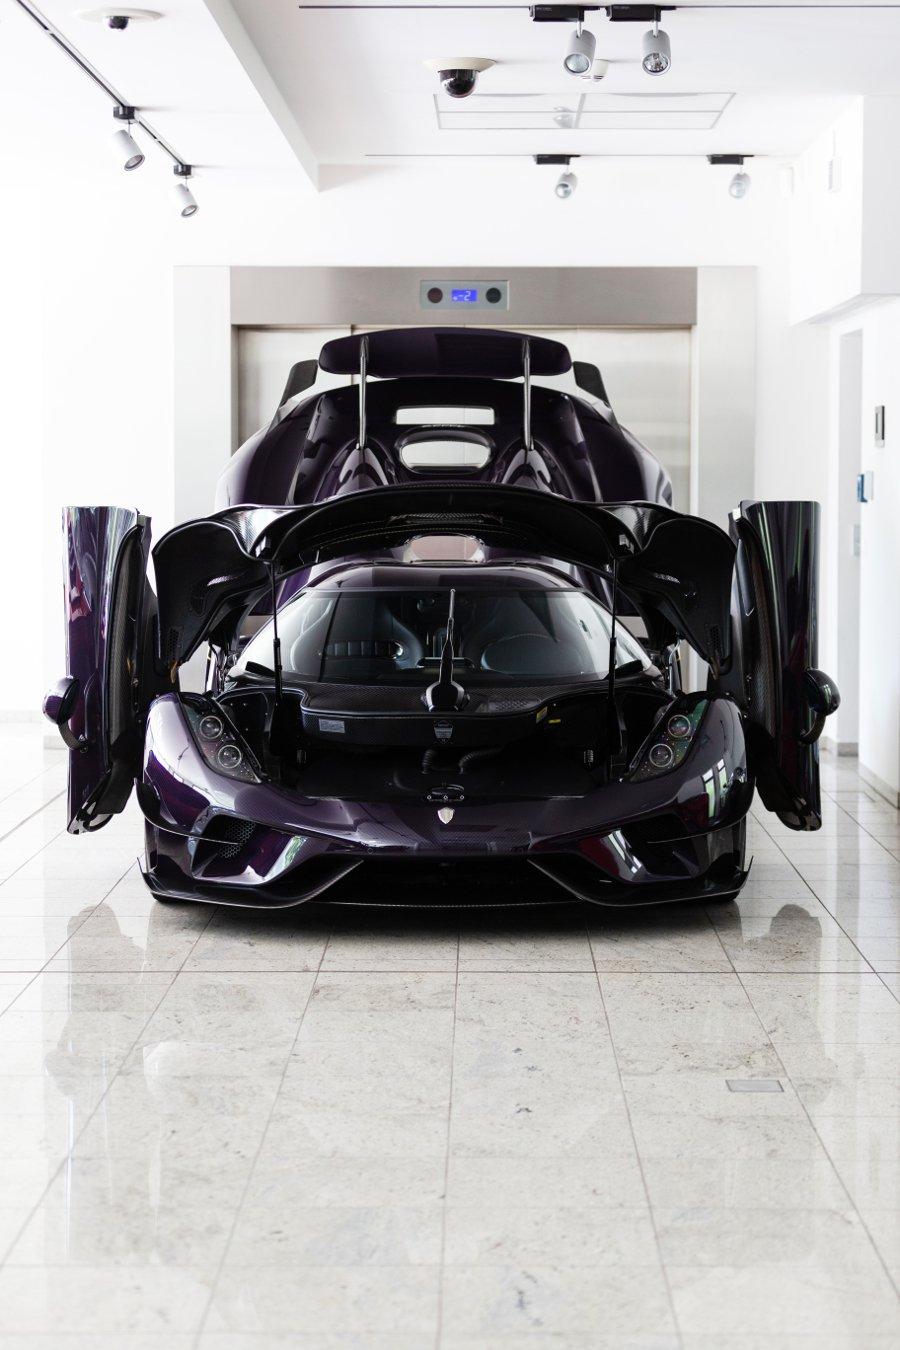 Koenigsegg-Regera-purple-carbon-for-sale-3